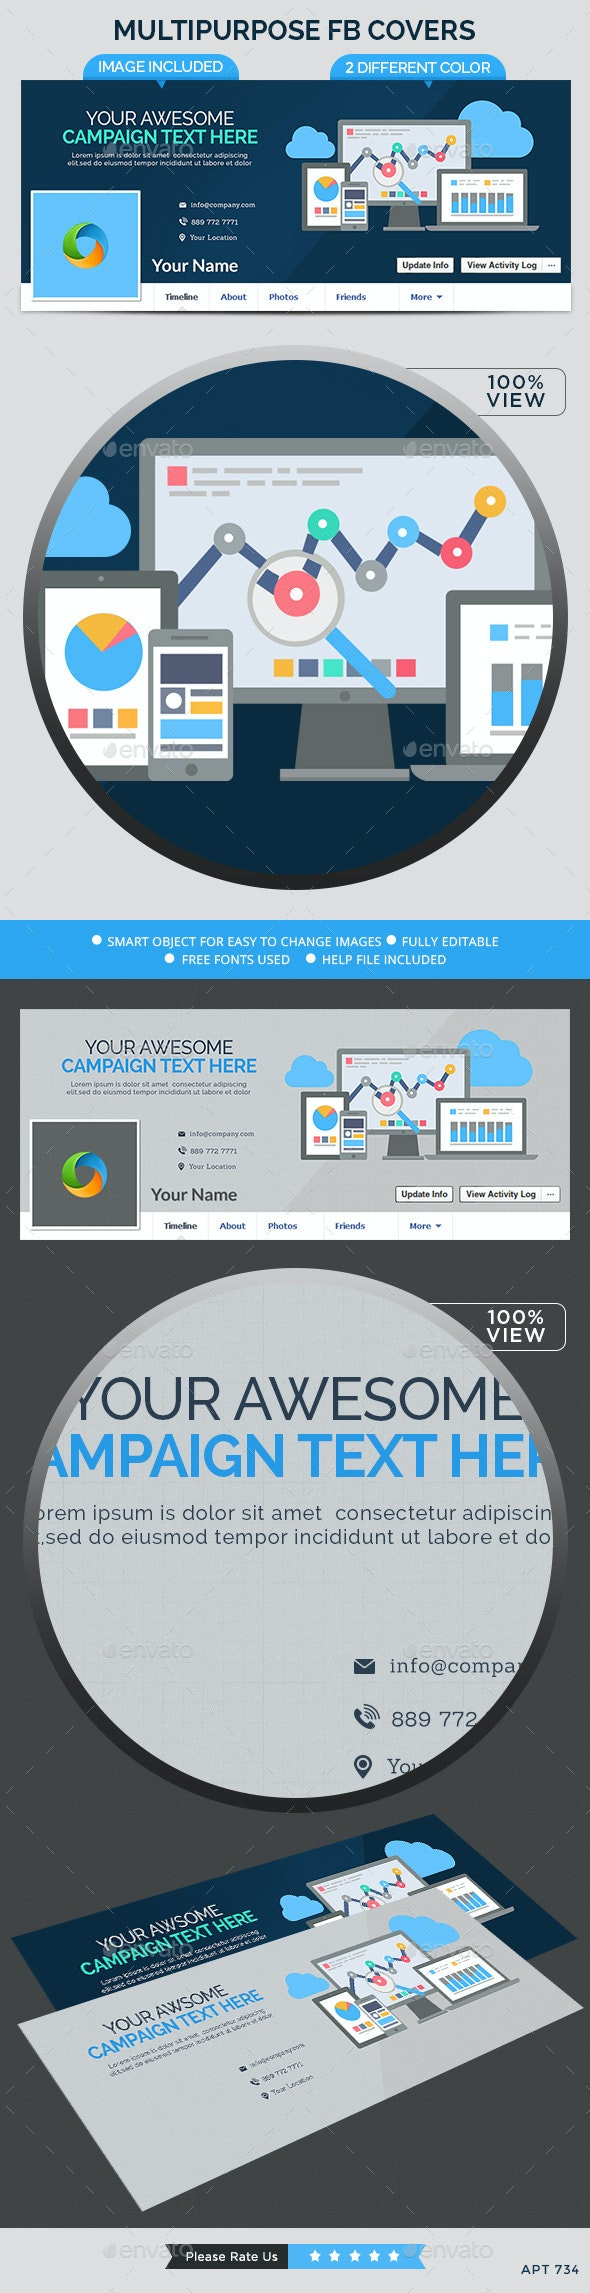 Mutipurpose Facebook Cover - Facebook Timeline Covers Social Media